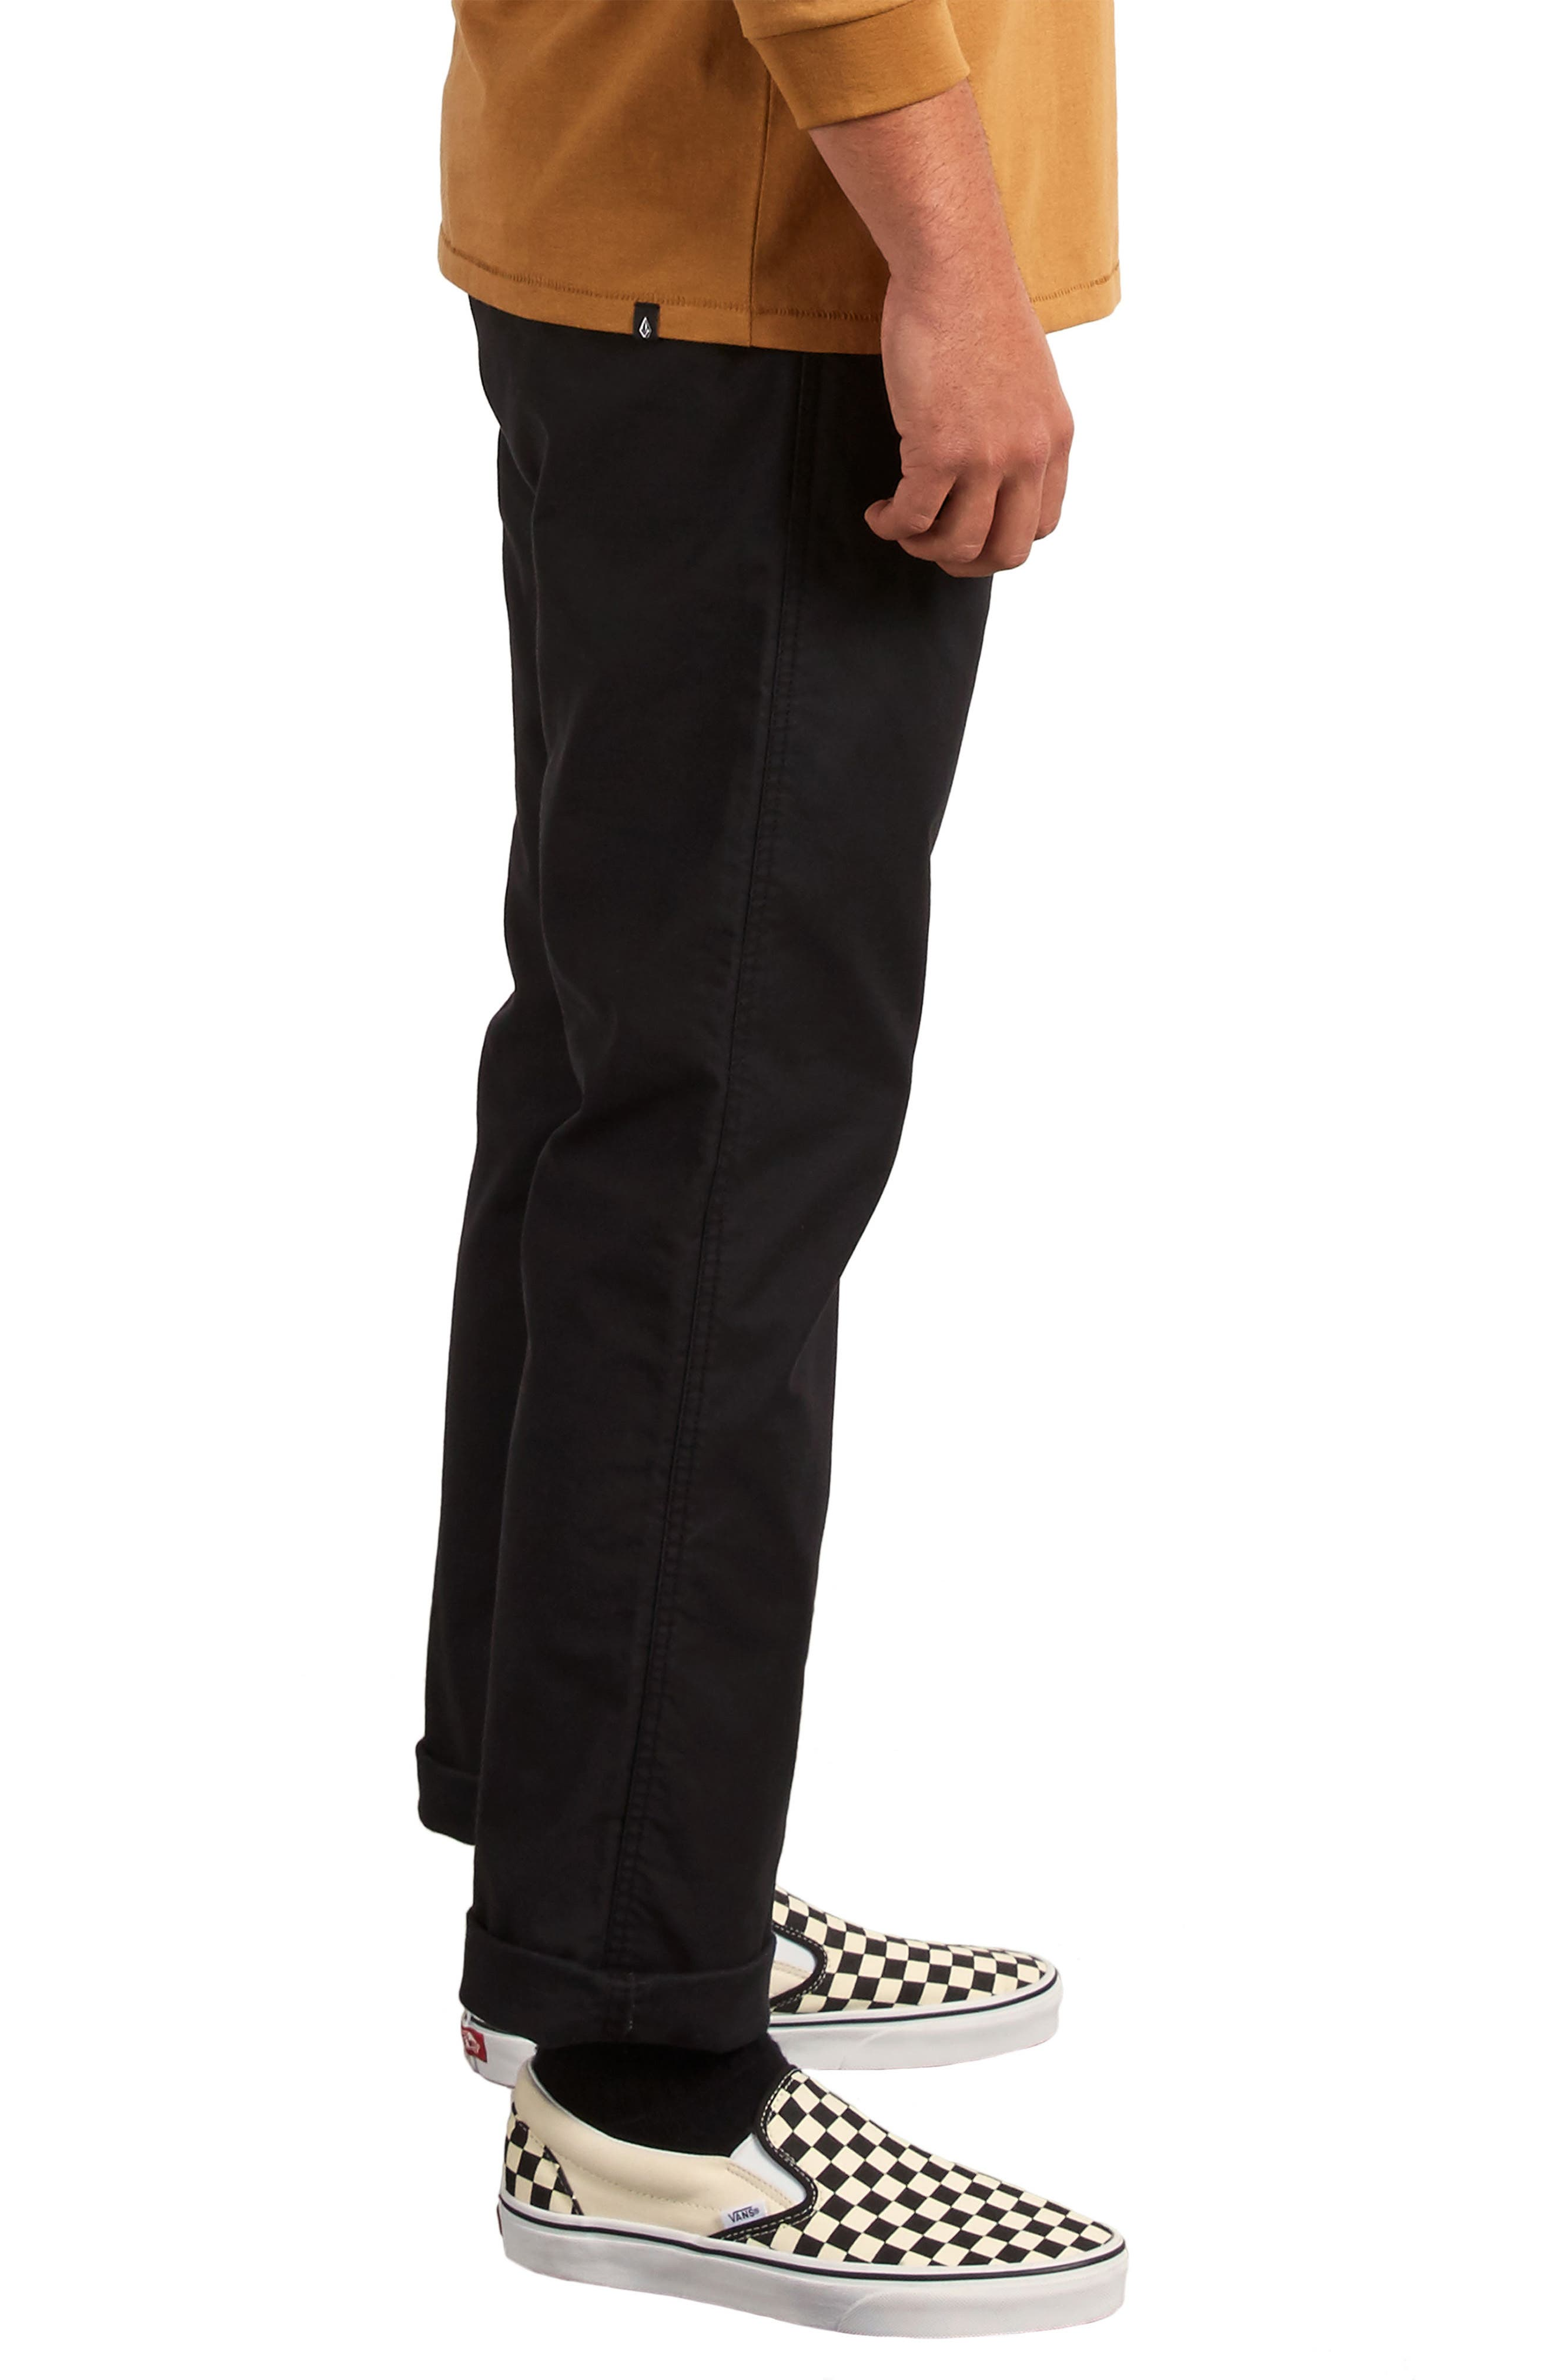 Gritter Modern Fit Straight Leg Chino Pants,                             Alternate thumbnail 3, color,                             BLACK